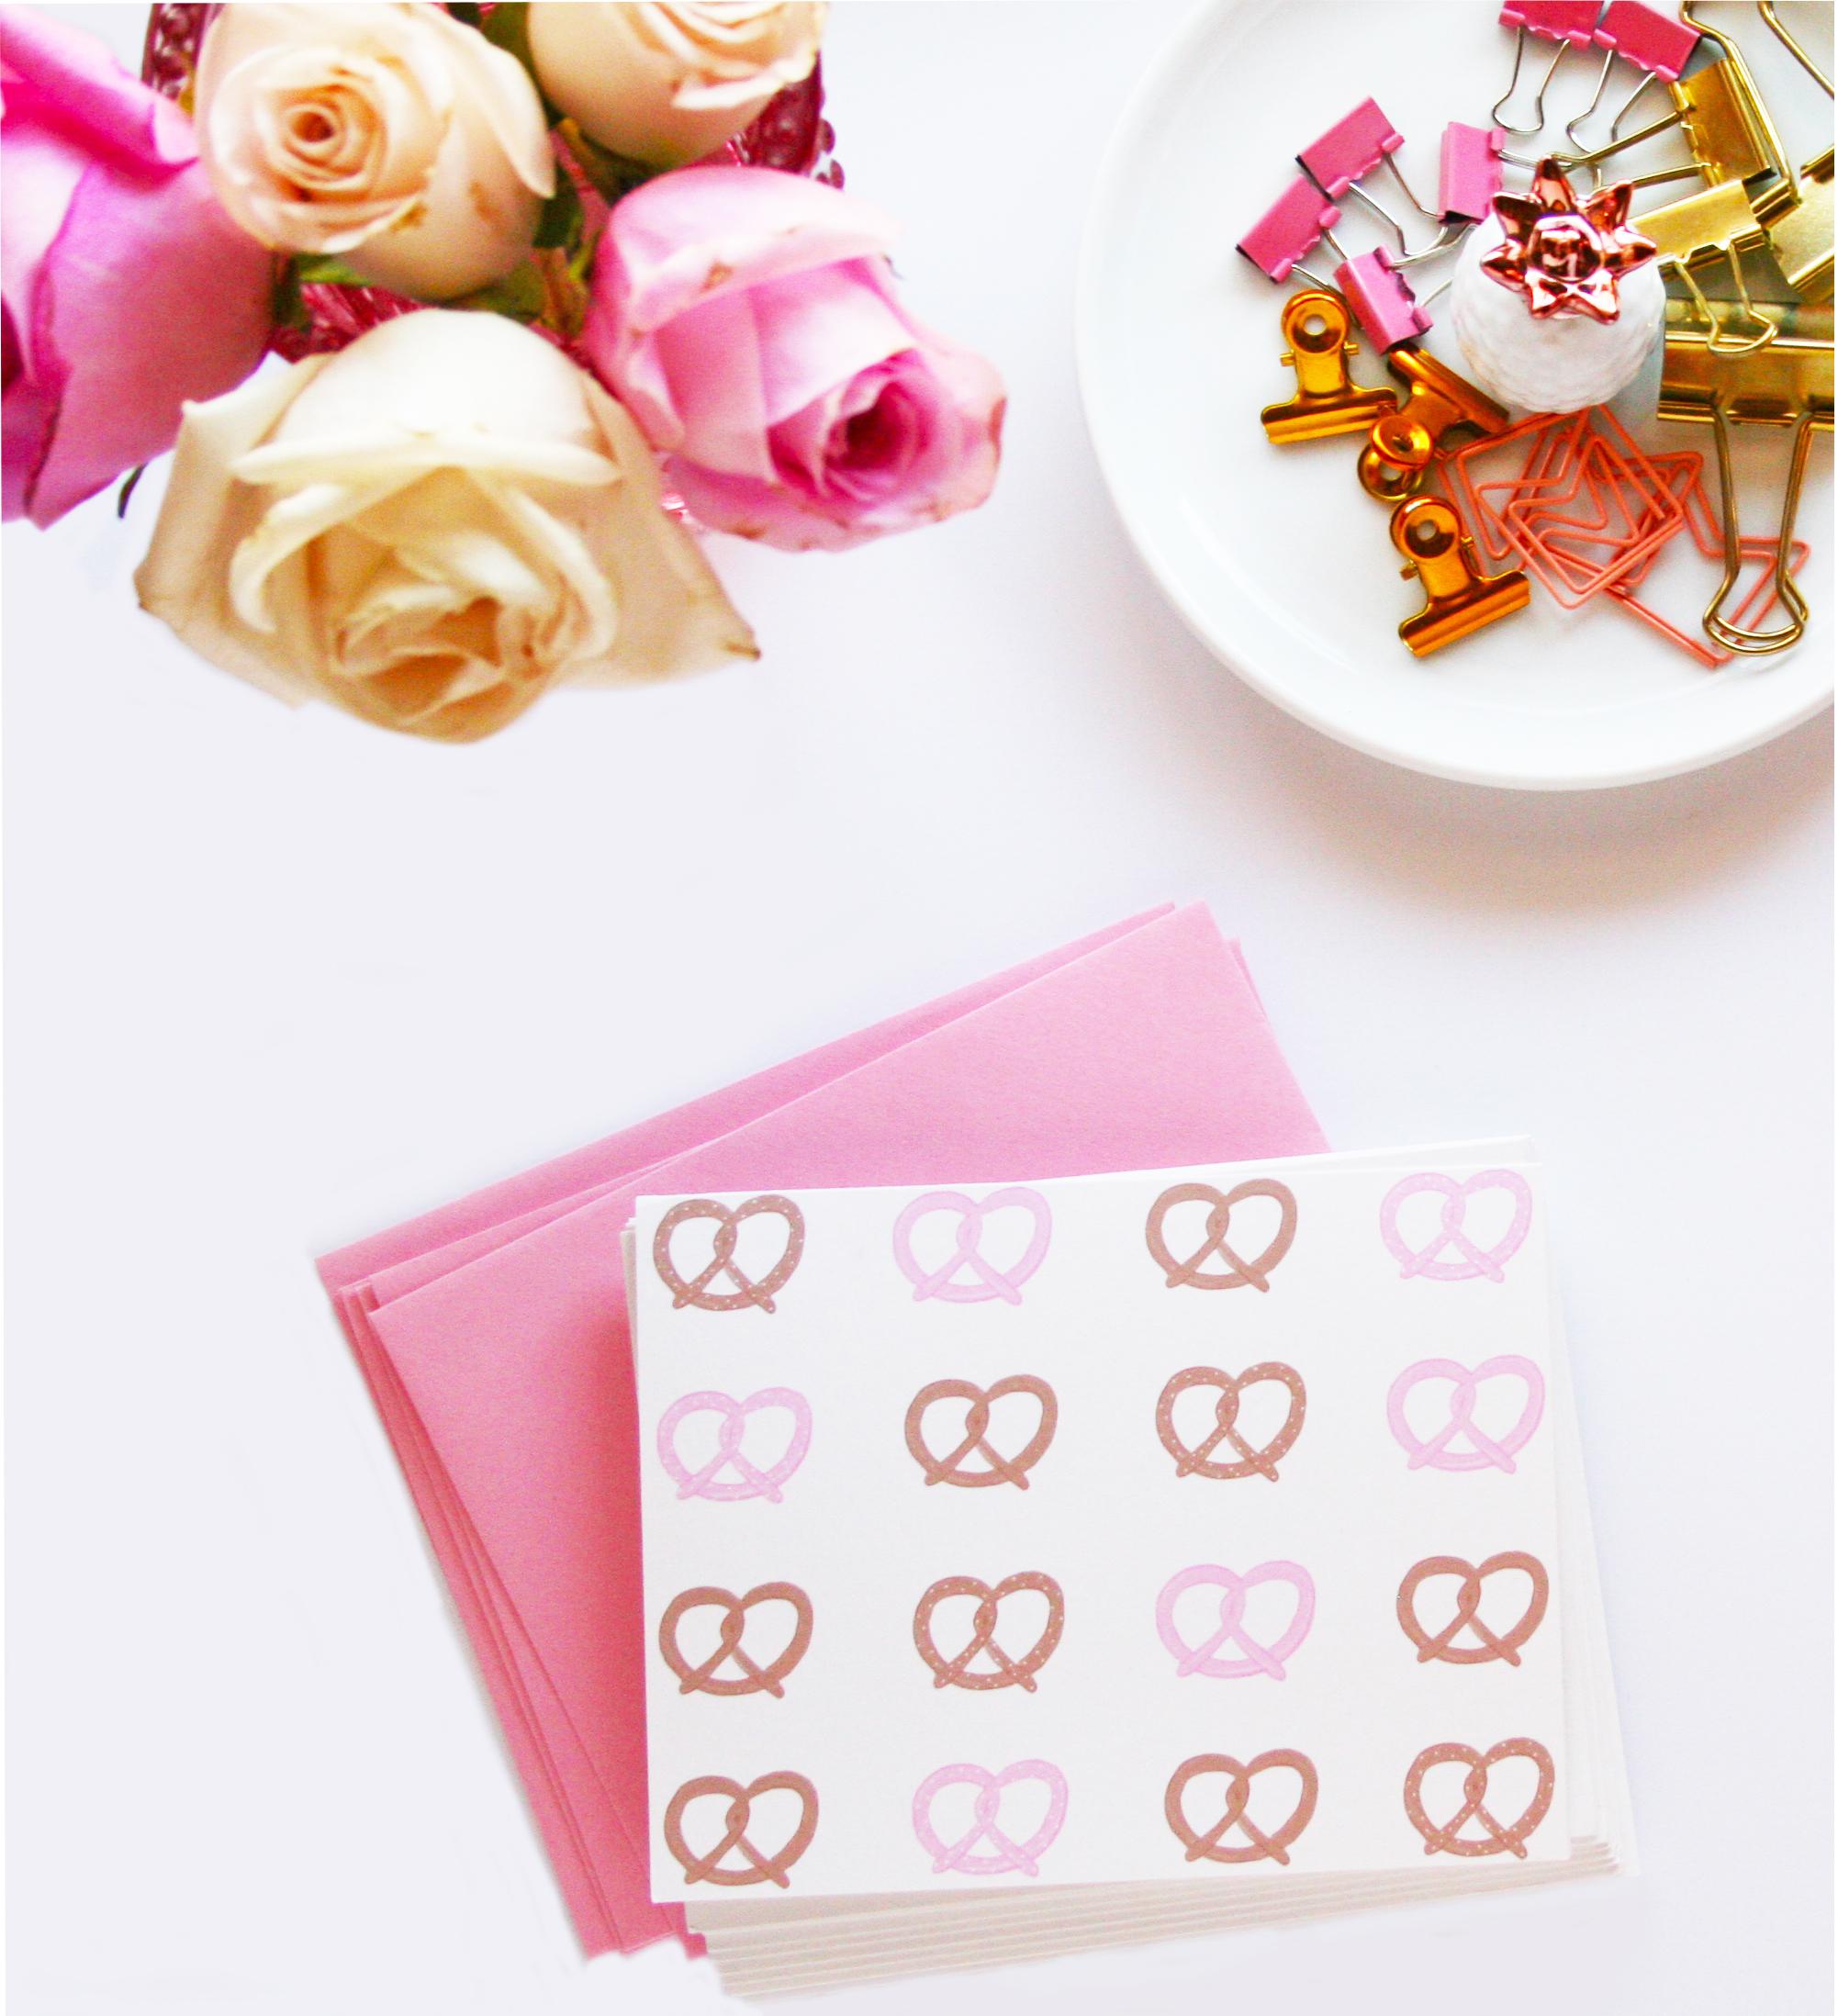 Pink Pretzel Pattern Stationery Set